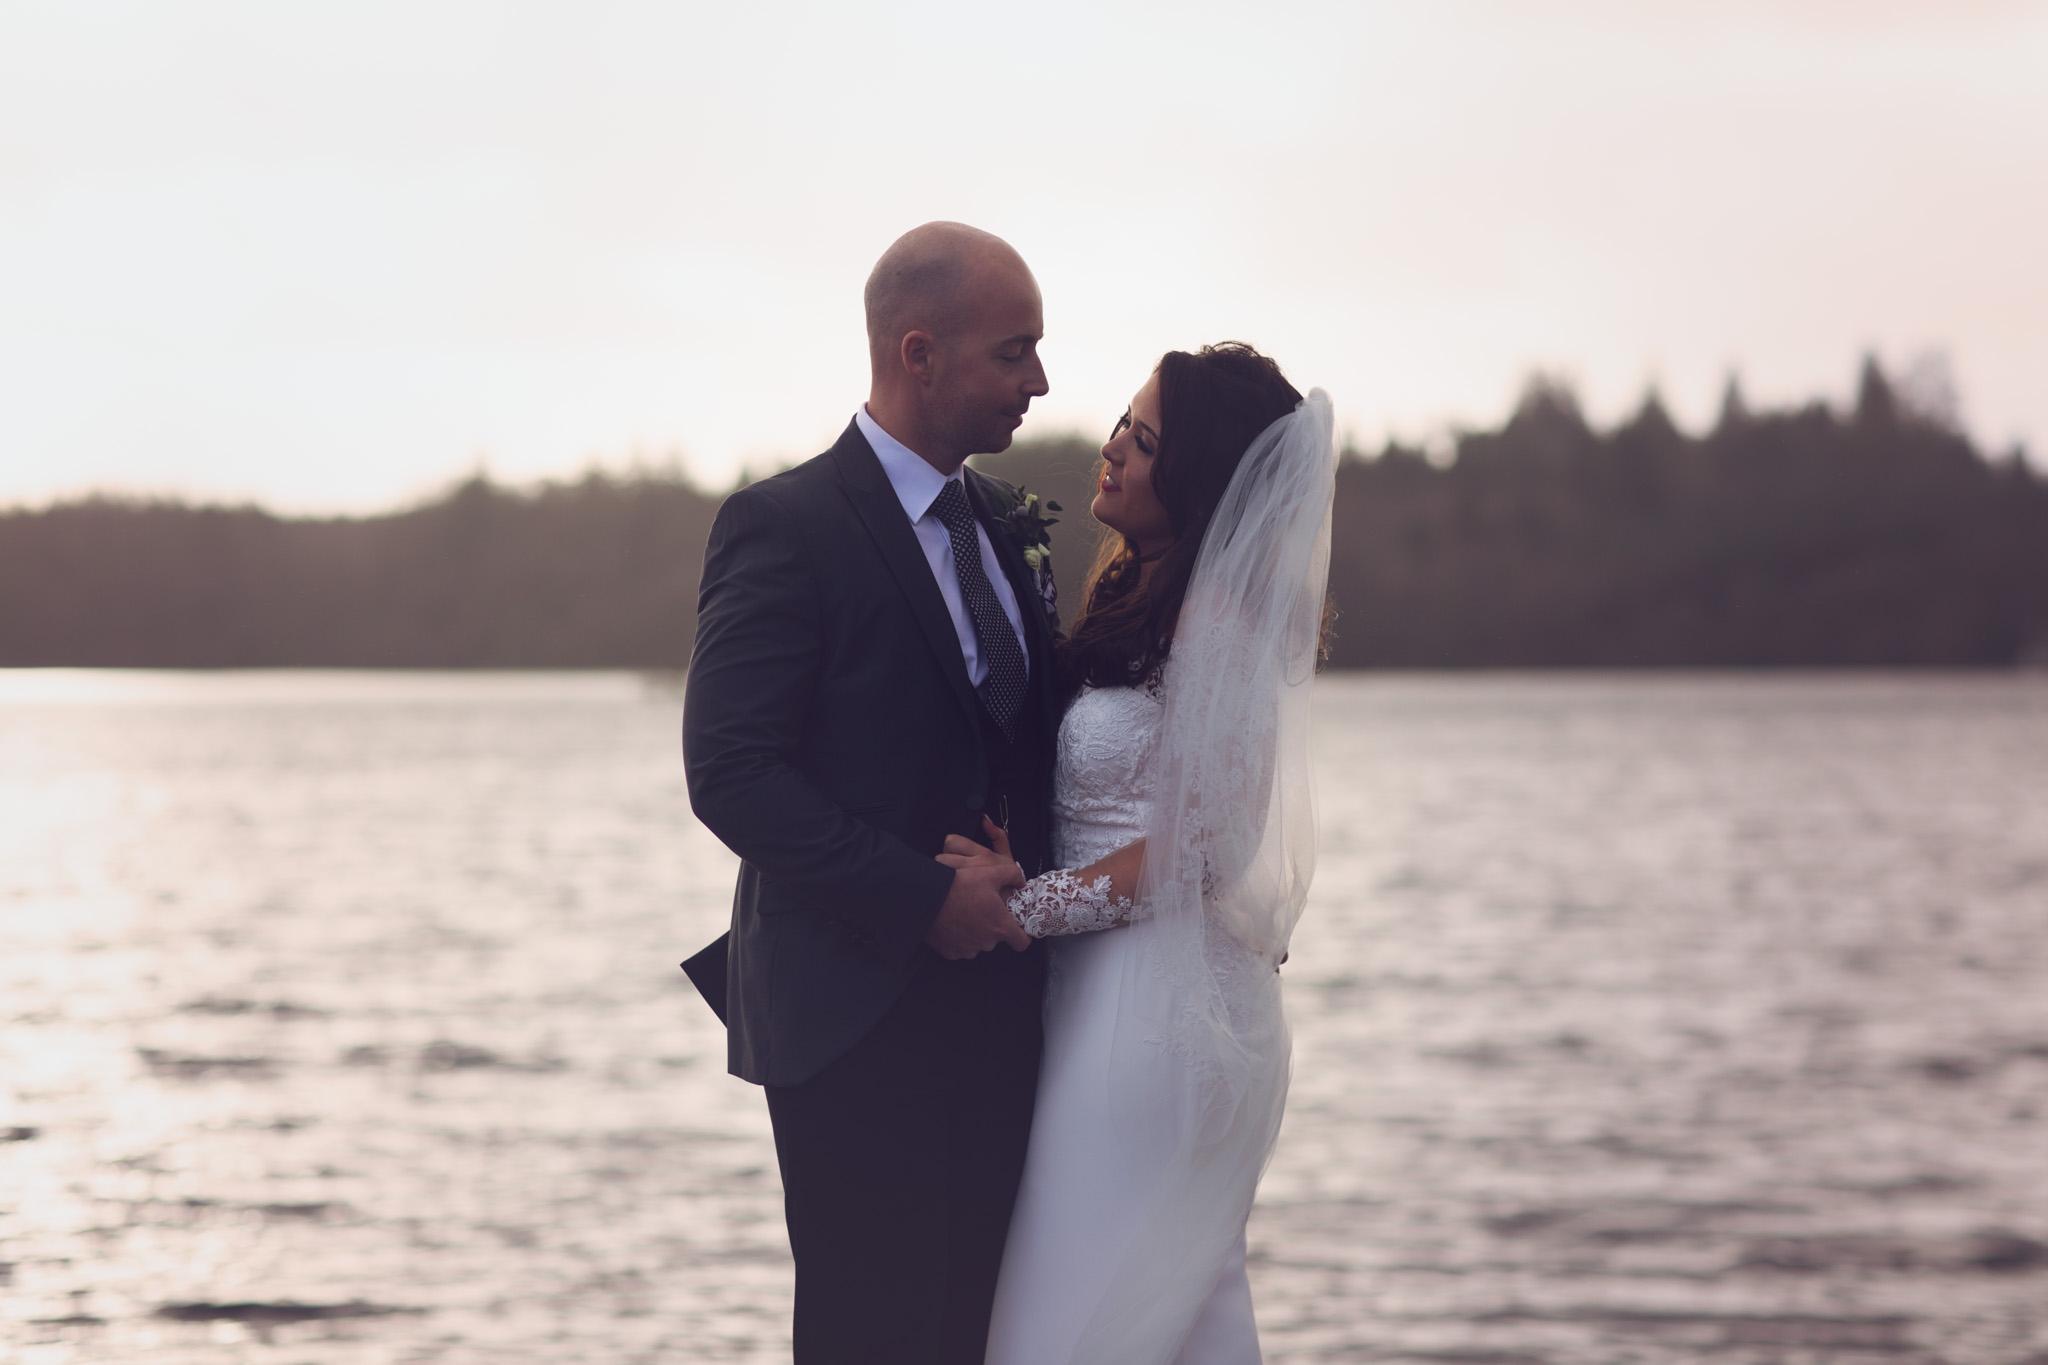 Mark_Barnes_Northern_Ireland_wedding_photographer_Harveys_Point_Donegall_Wedding_photography-Adam&Gemma-34.jpg